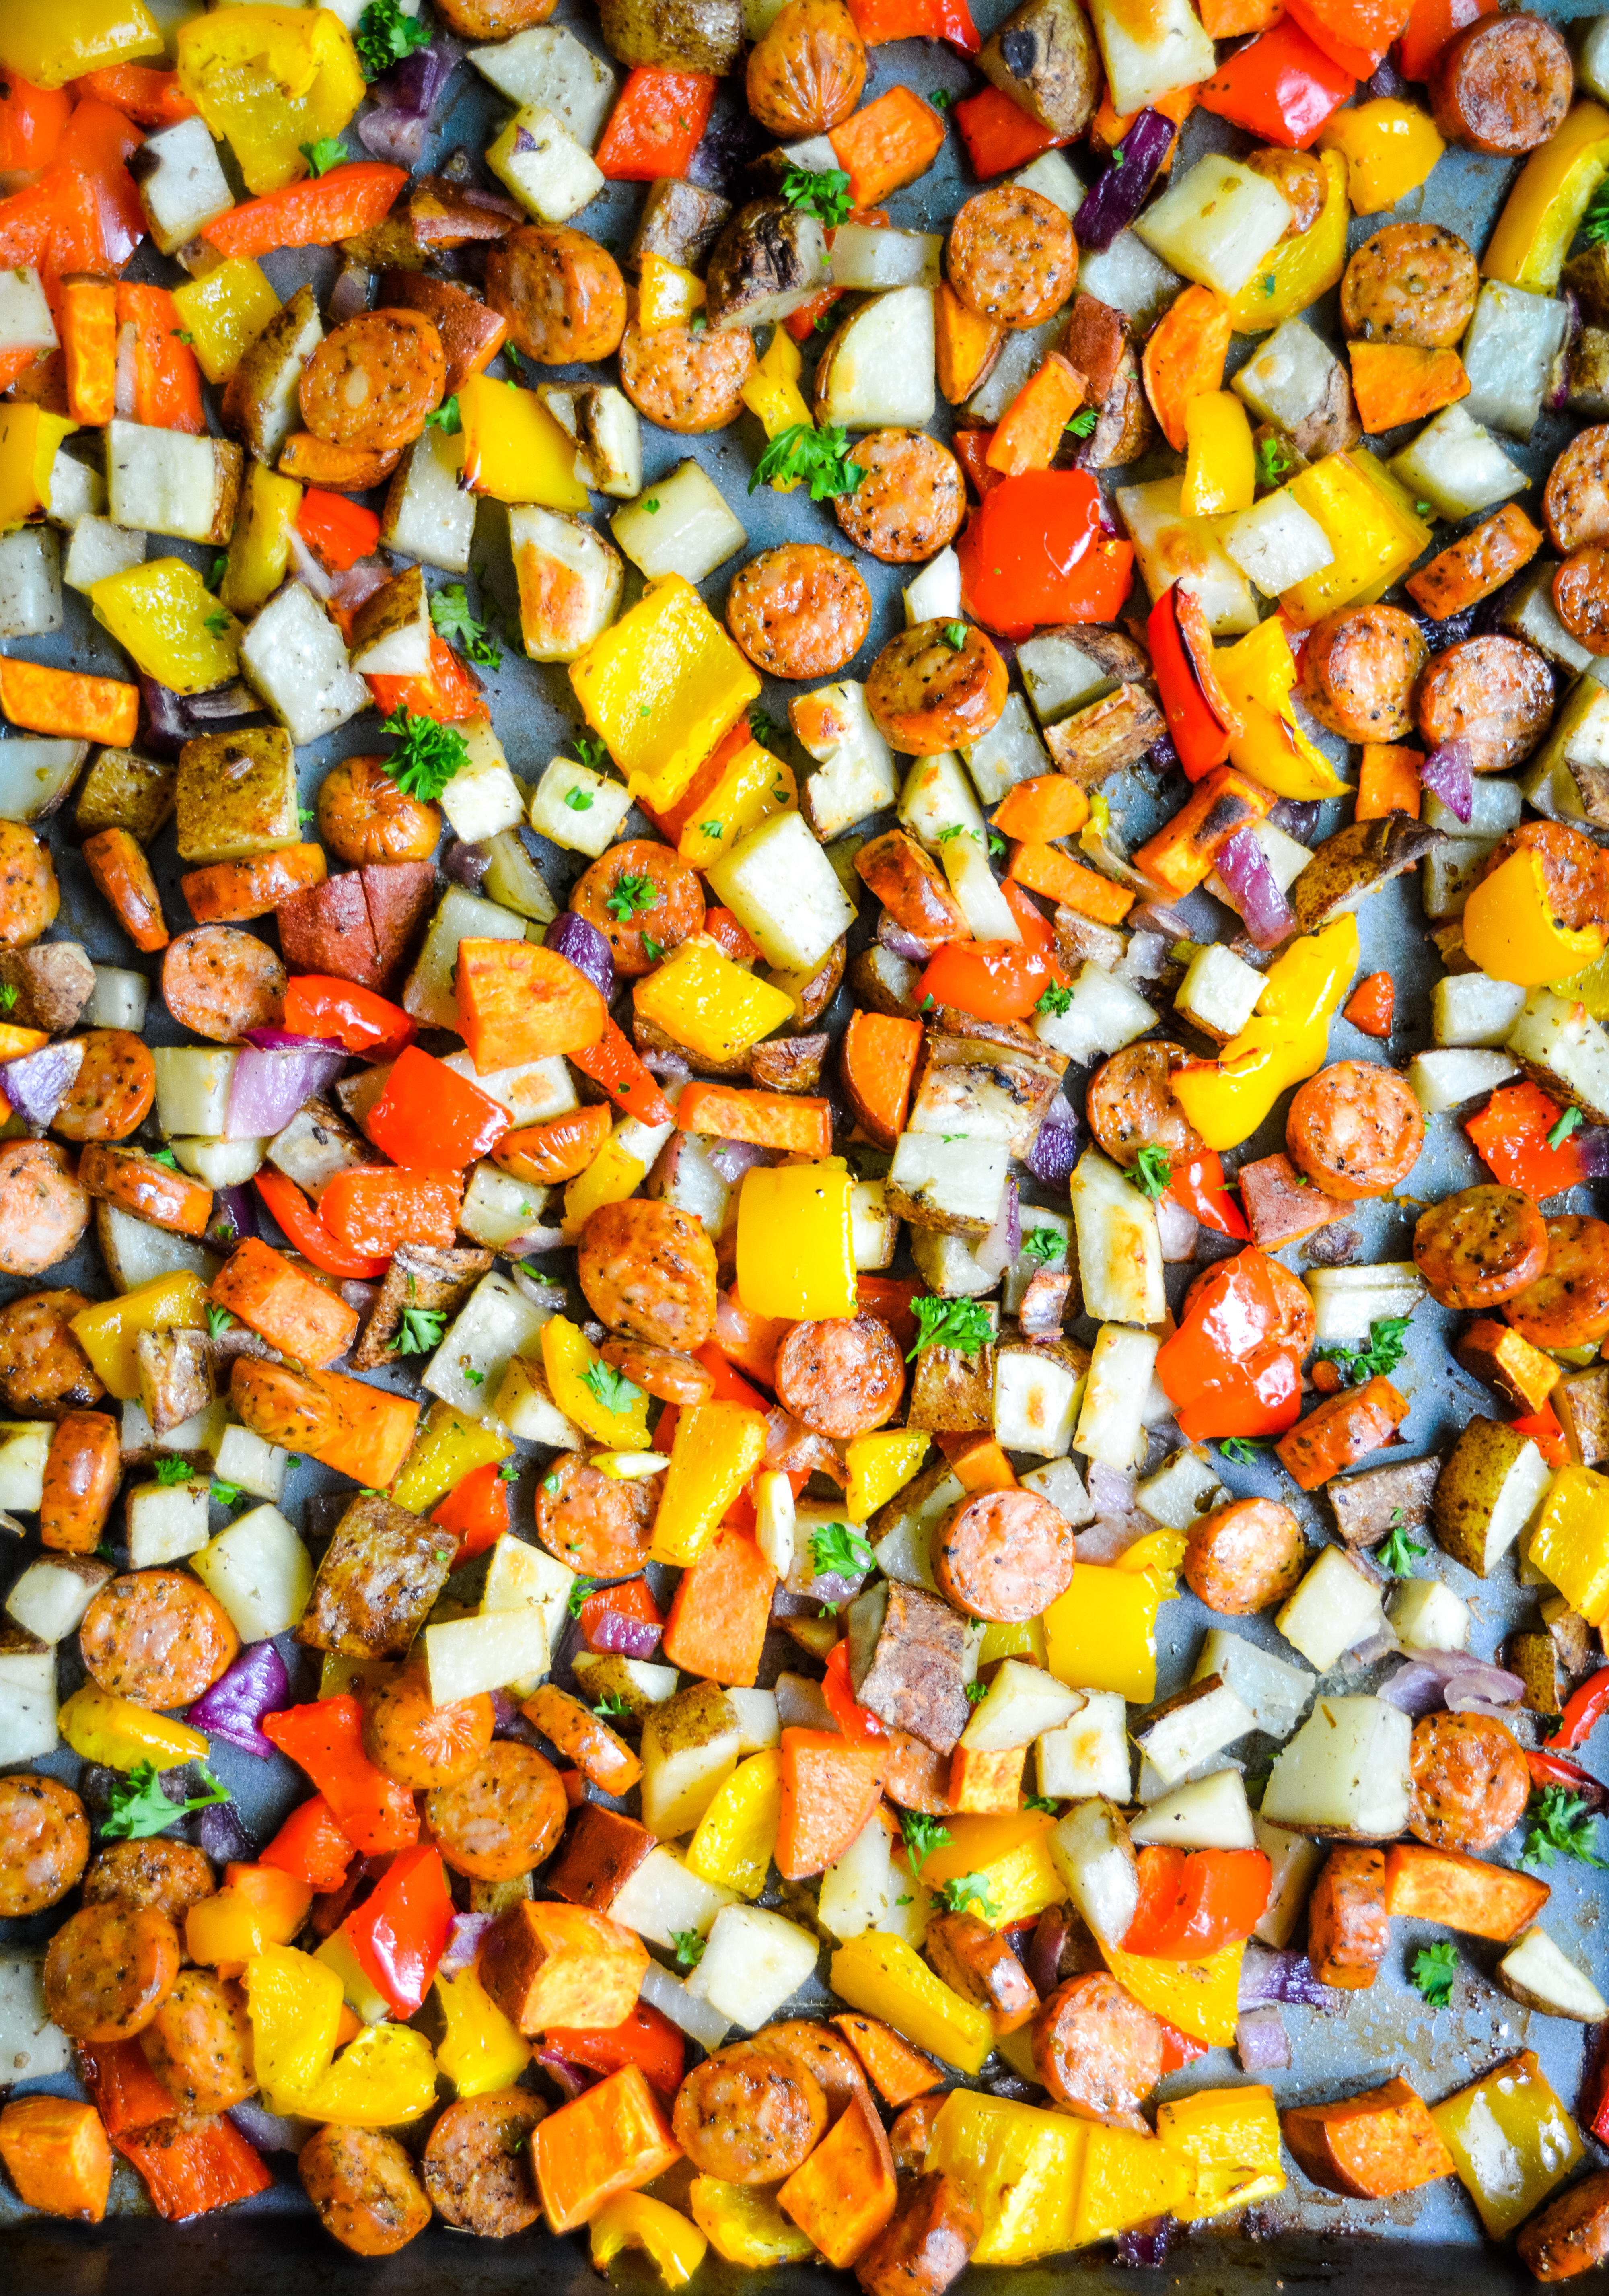 Sheet Pan Roasted Sausage, Peppers & Potatoes